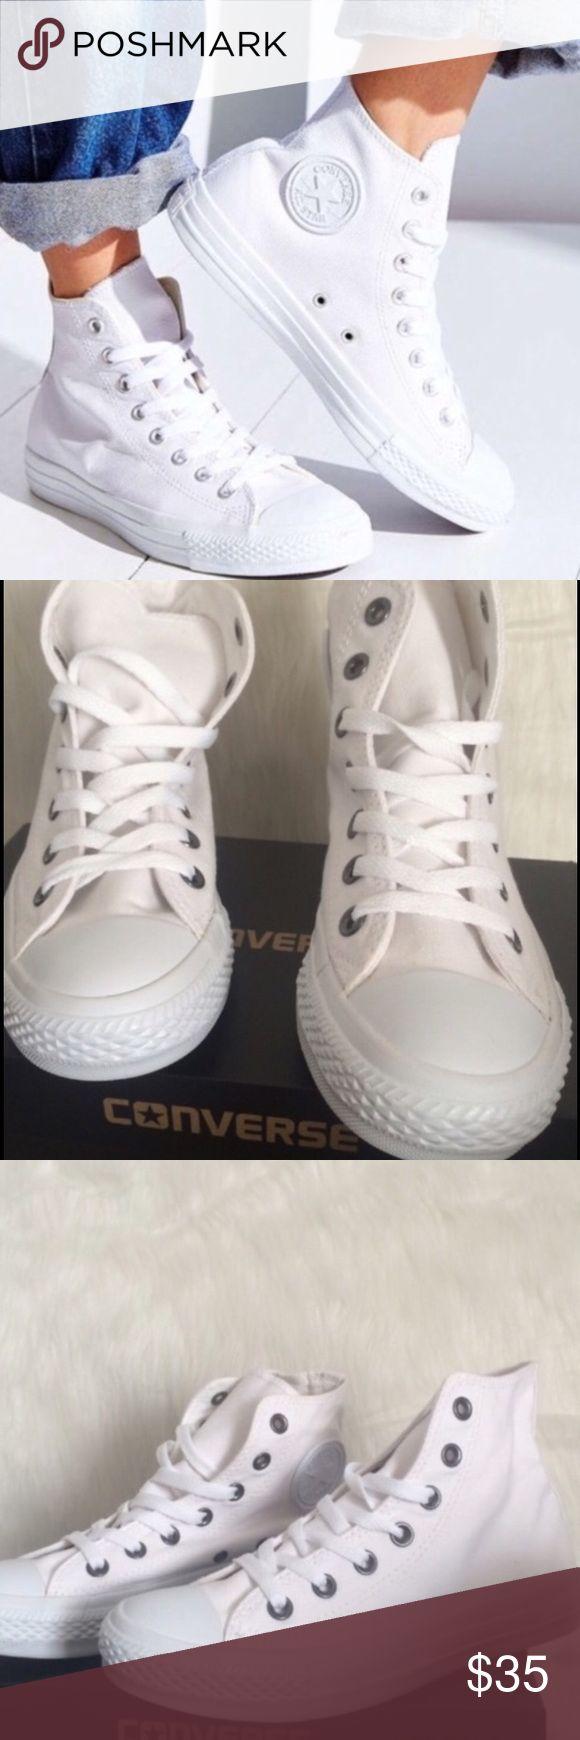 💄FLASH SALE💄CONVERSE WHITE WOMENS SIZE 9.5 SHOES No box Converse Shoes Sneakers